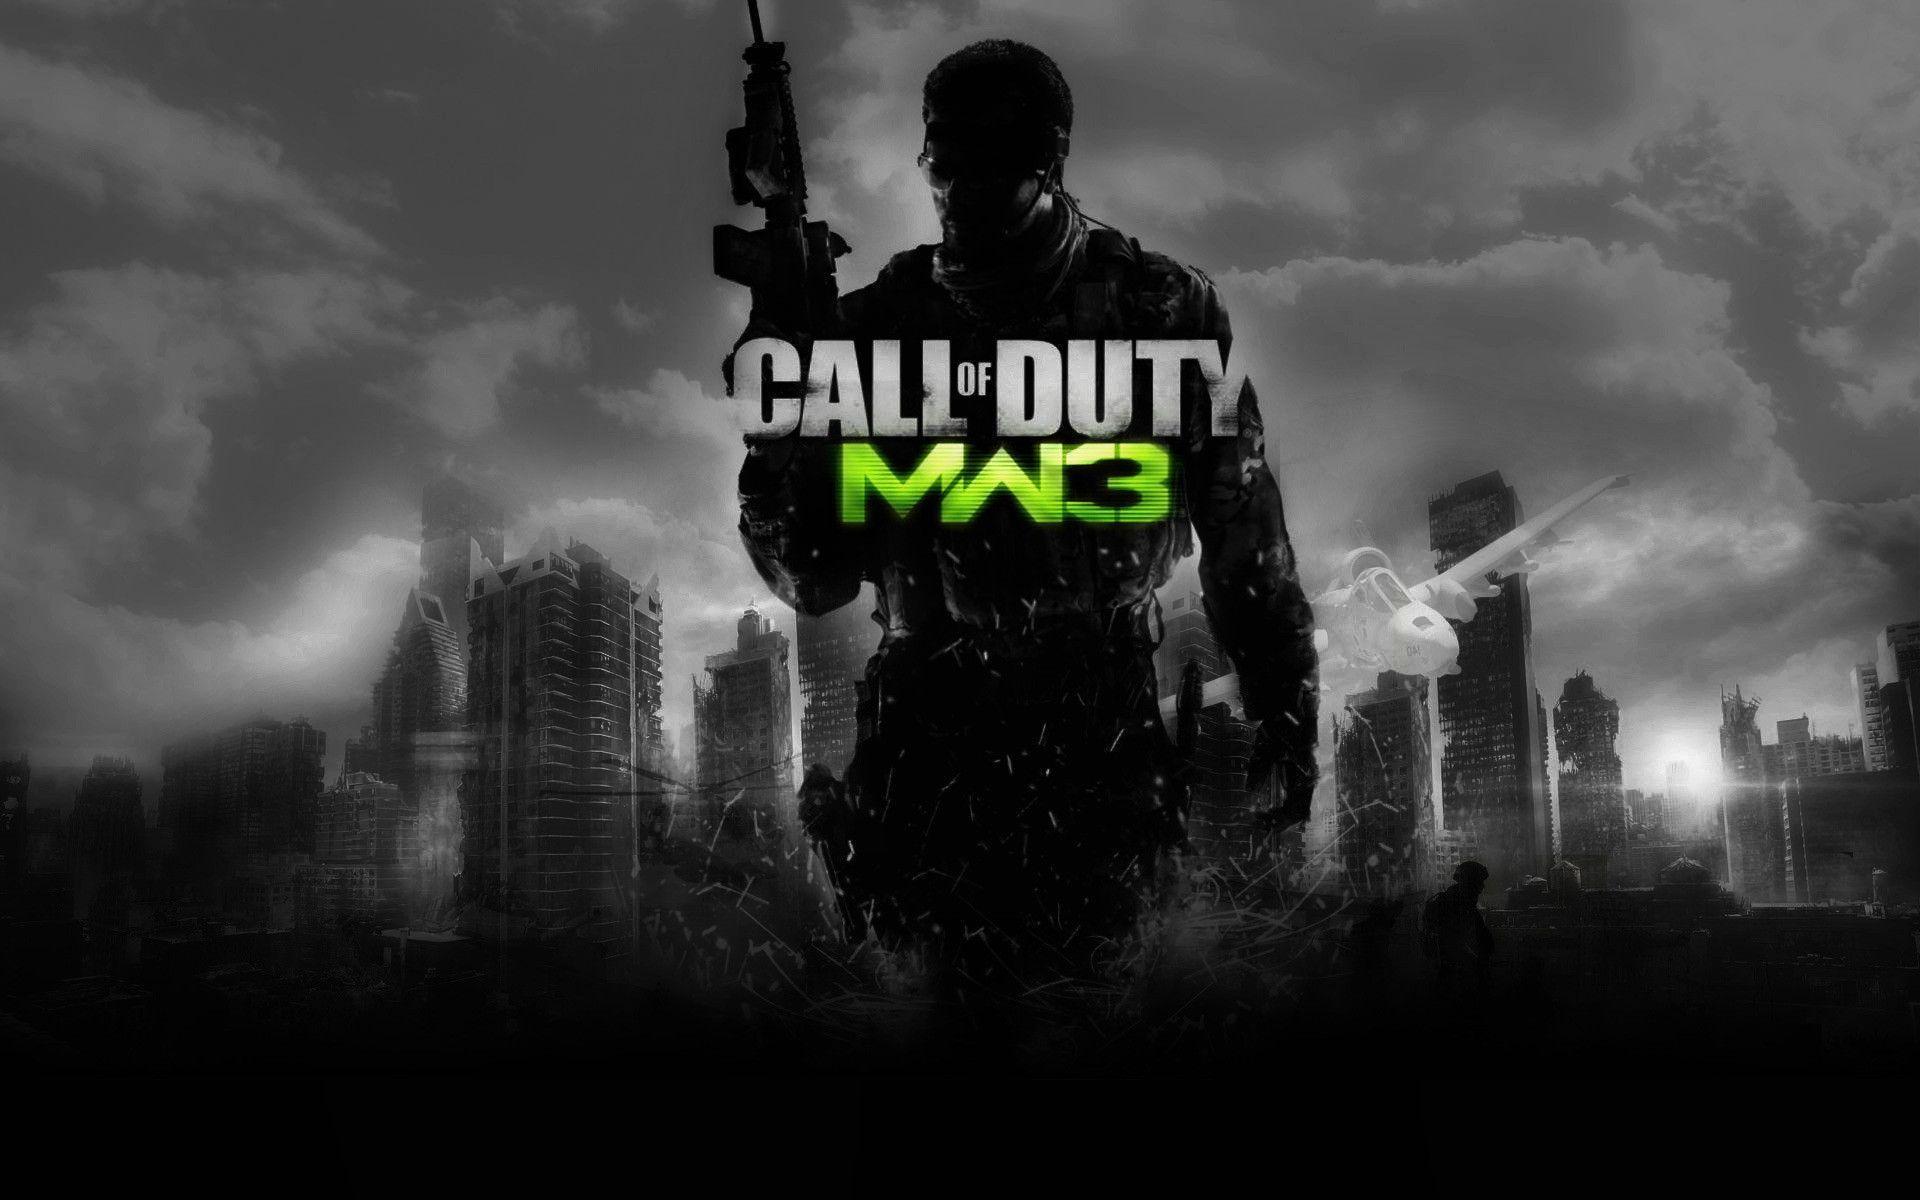 Call Of Duty Modern Warfare 3 Wallpapers - Wallpaper Cave